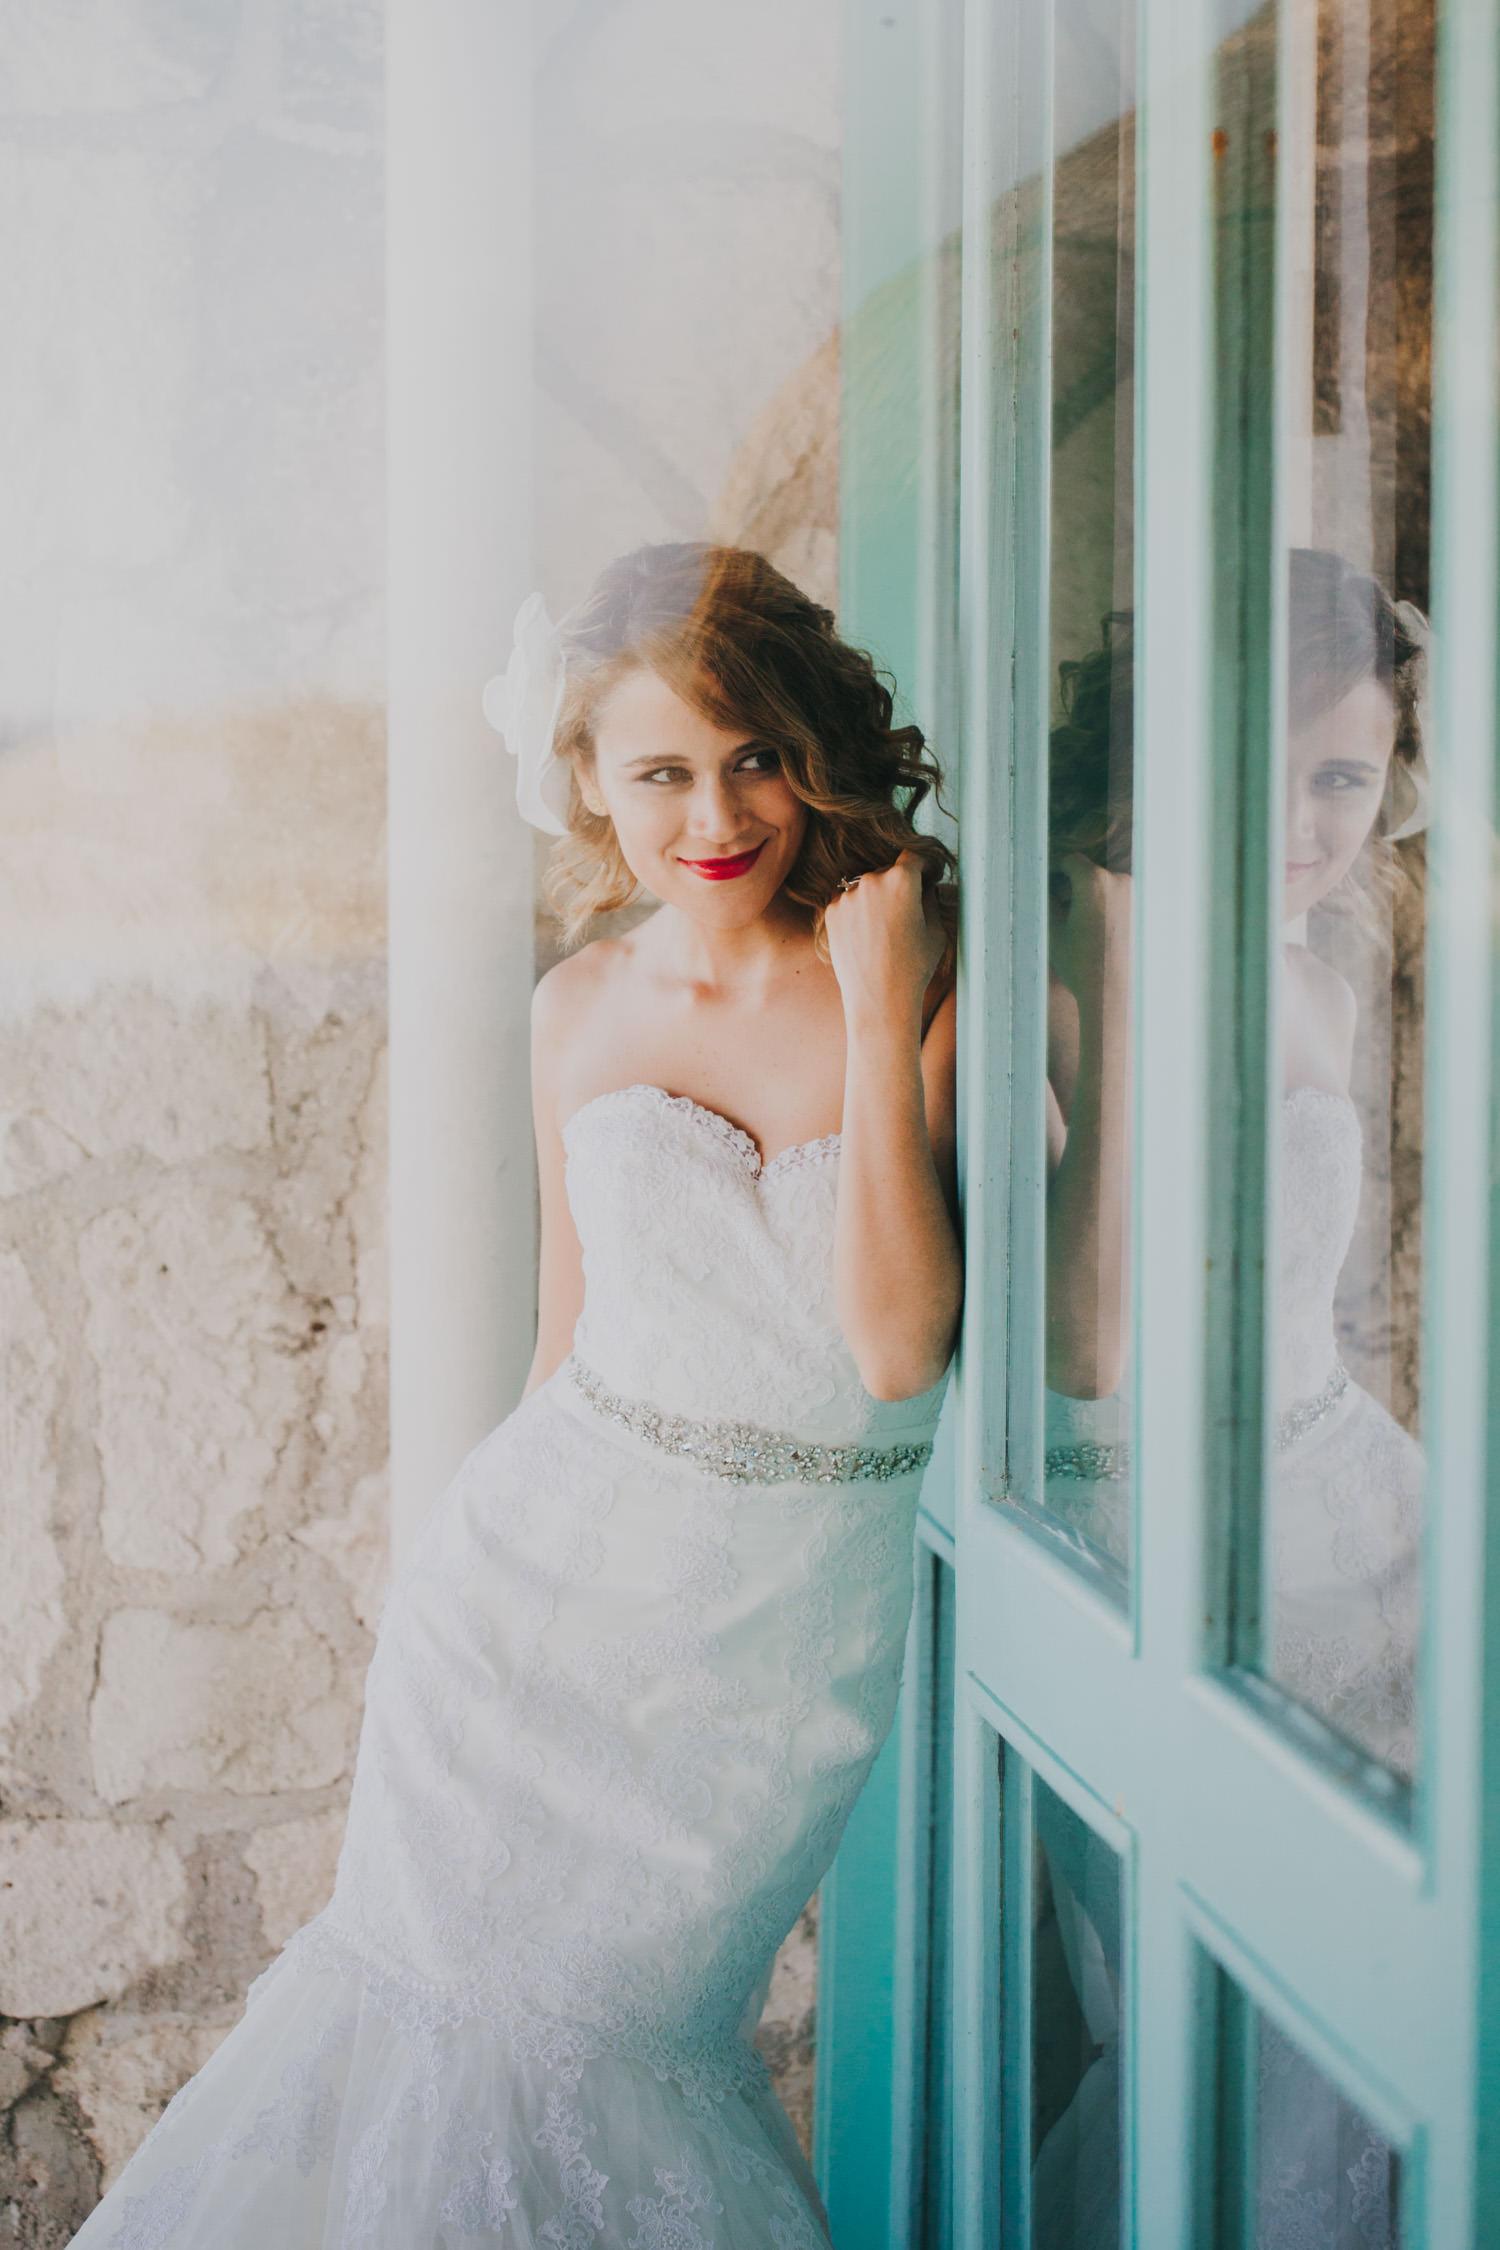 Tulum-Wedding-Photography-Bride-Pierce--17.jpg